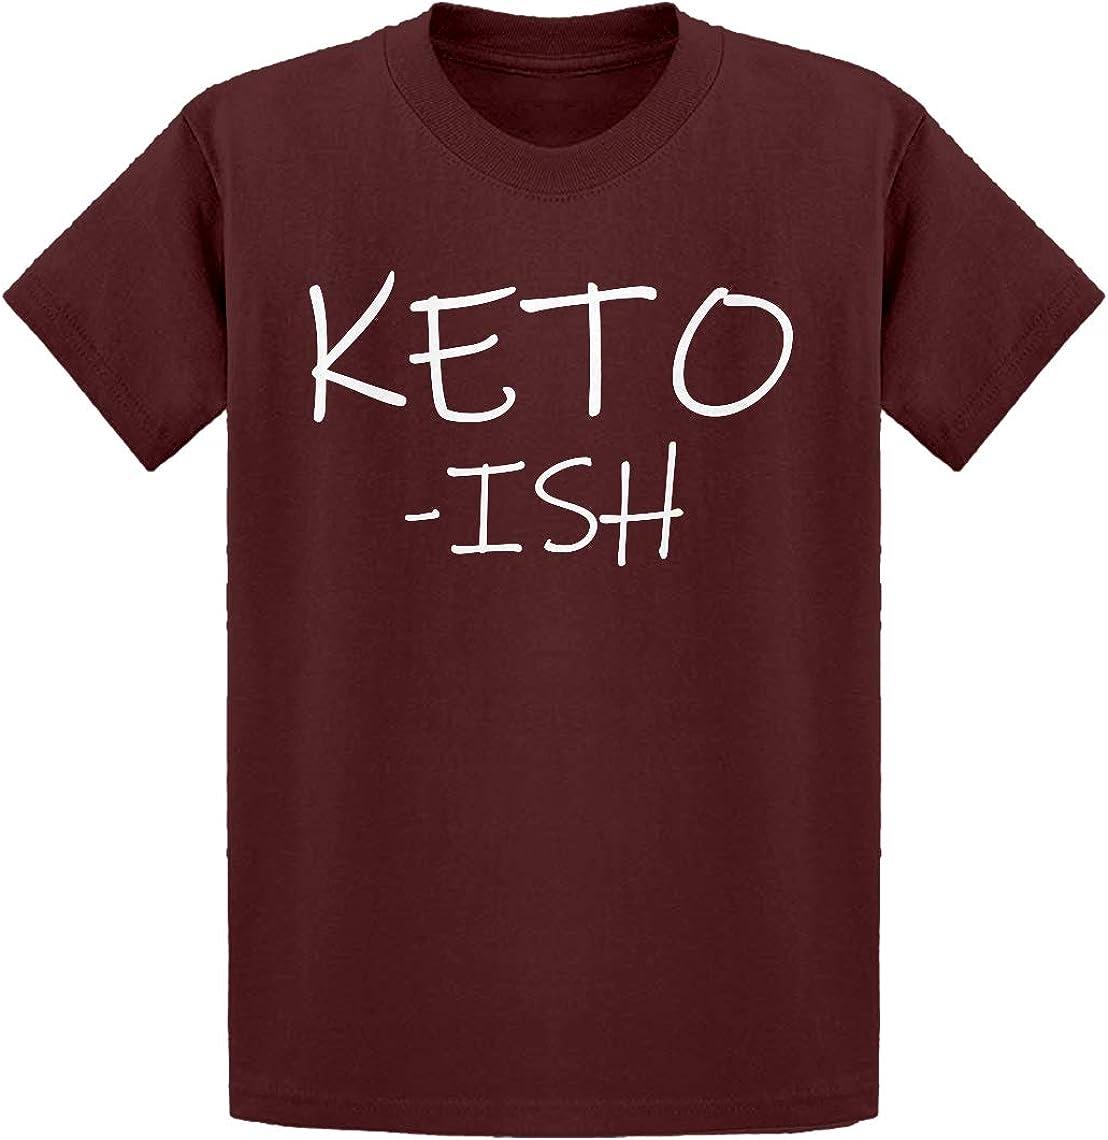 Indica Plateau Keto -ish Kids T-Shirt